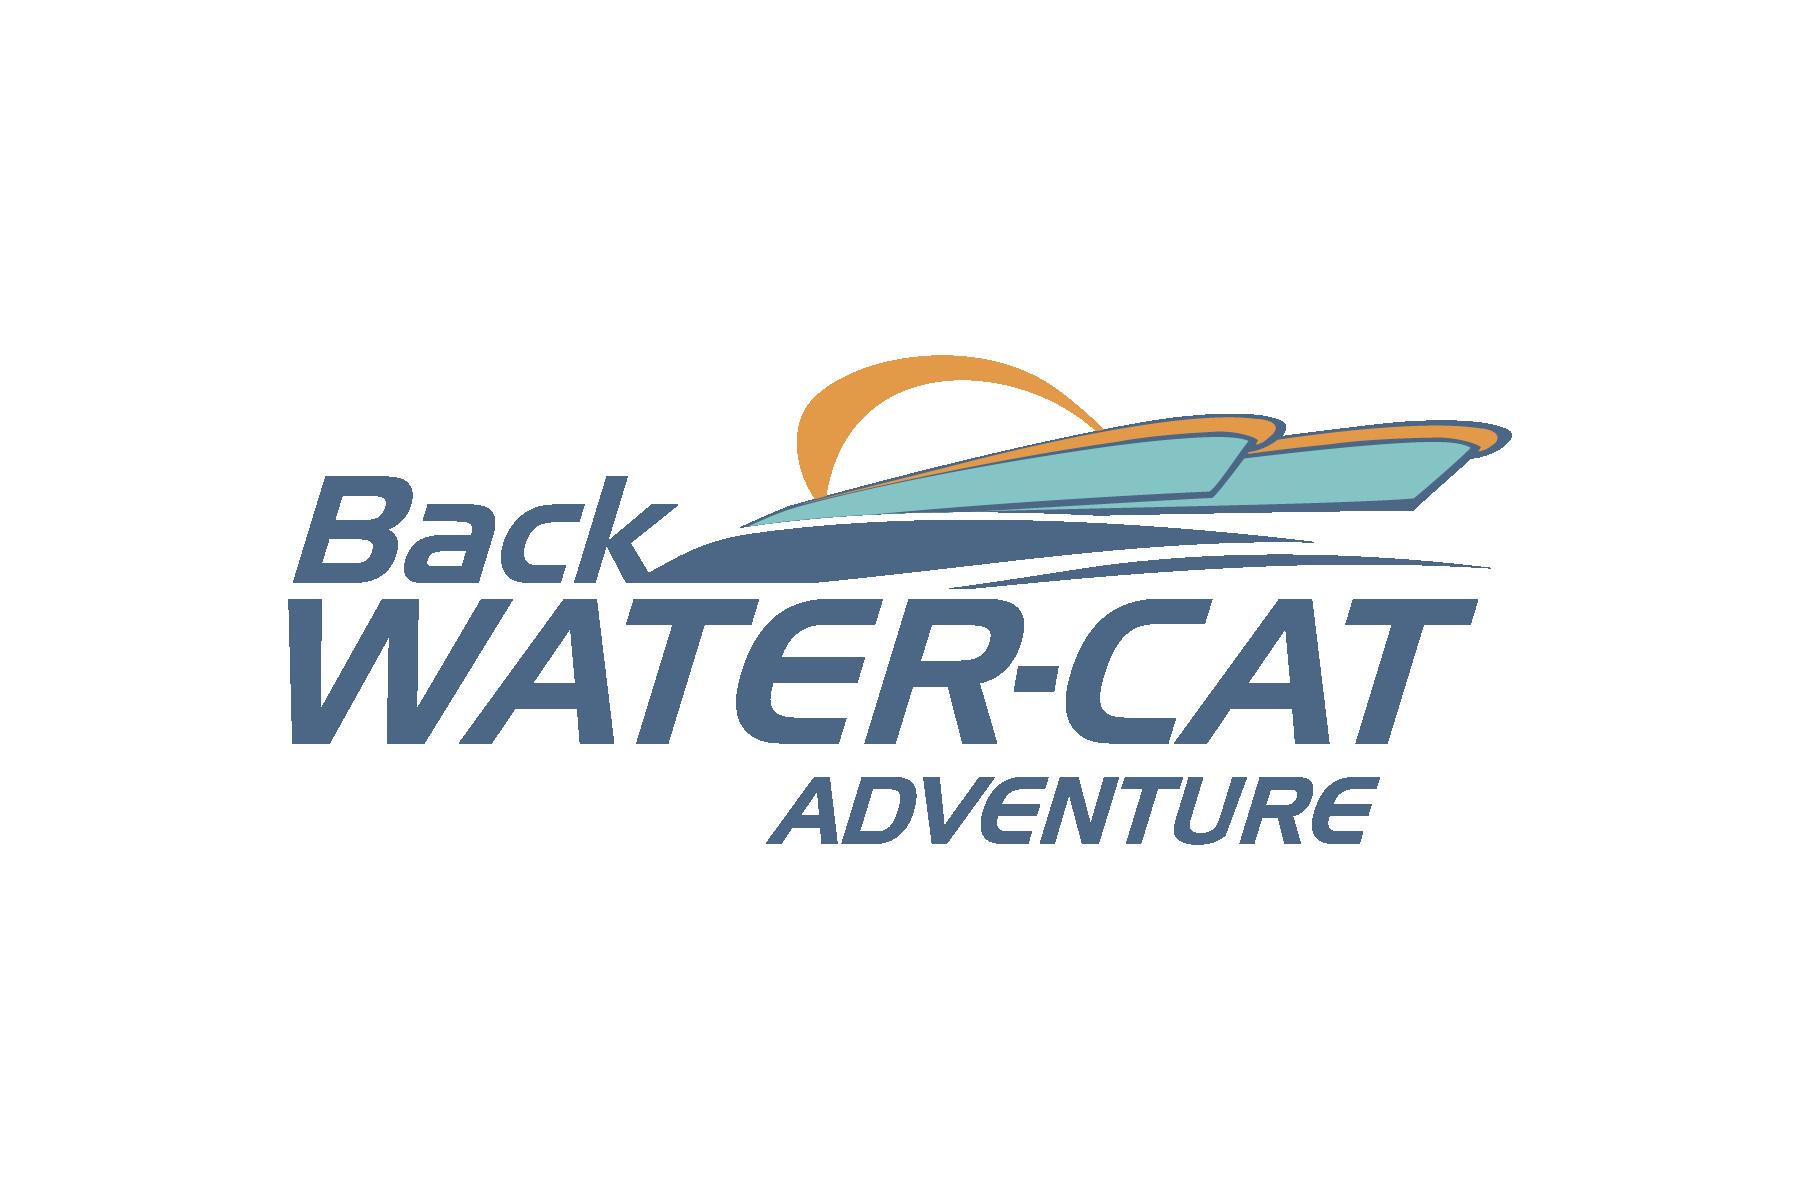 backwater cat adventure hilton head boat tours amelia island boat tours